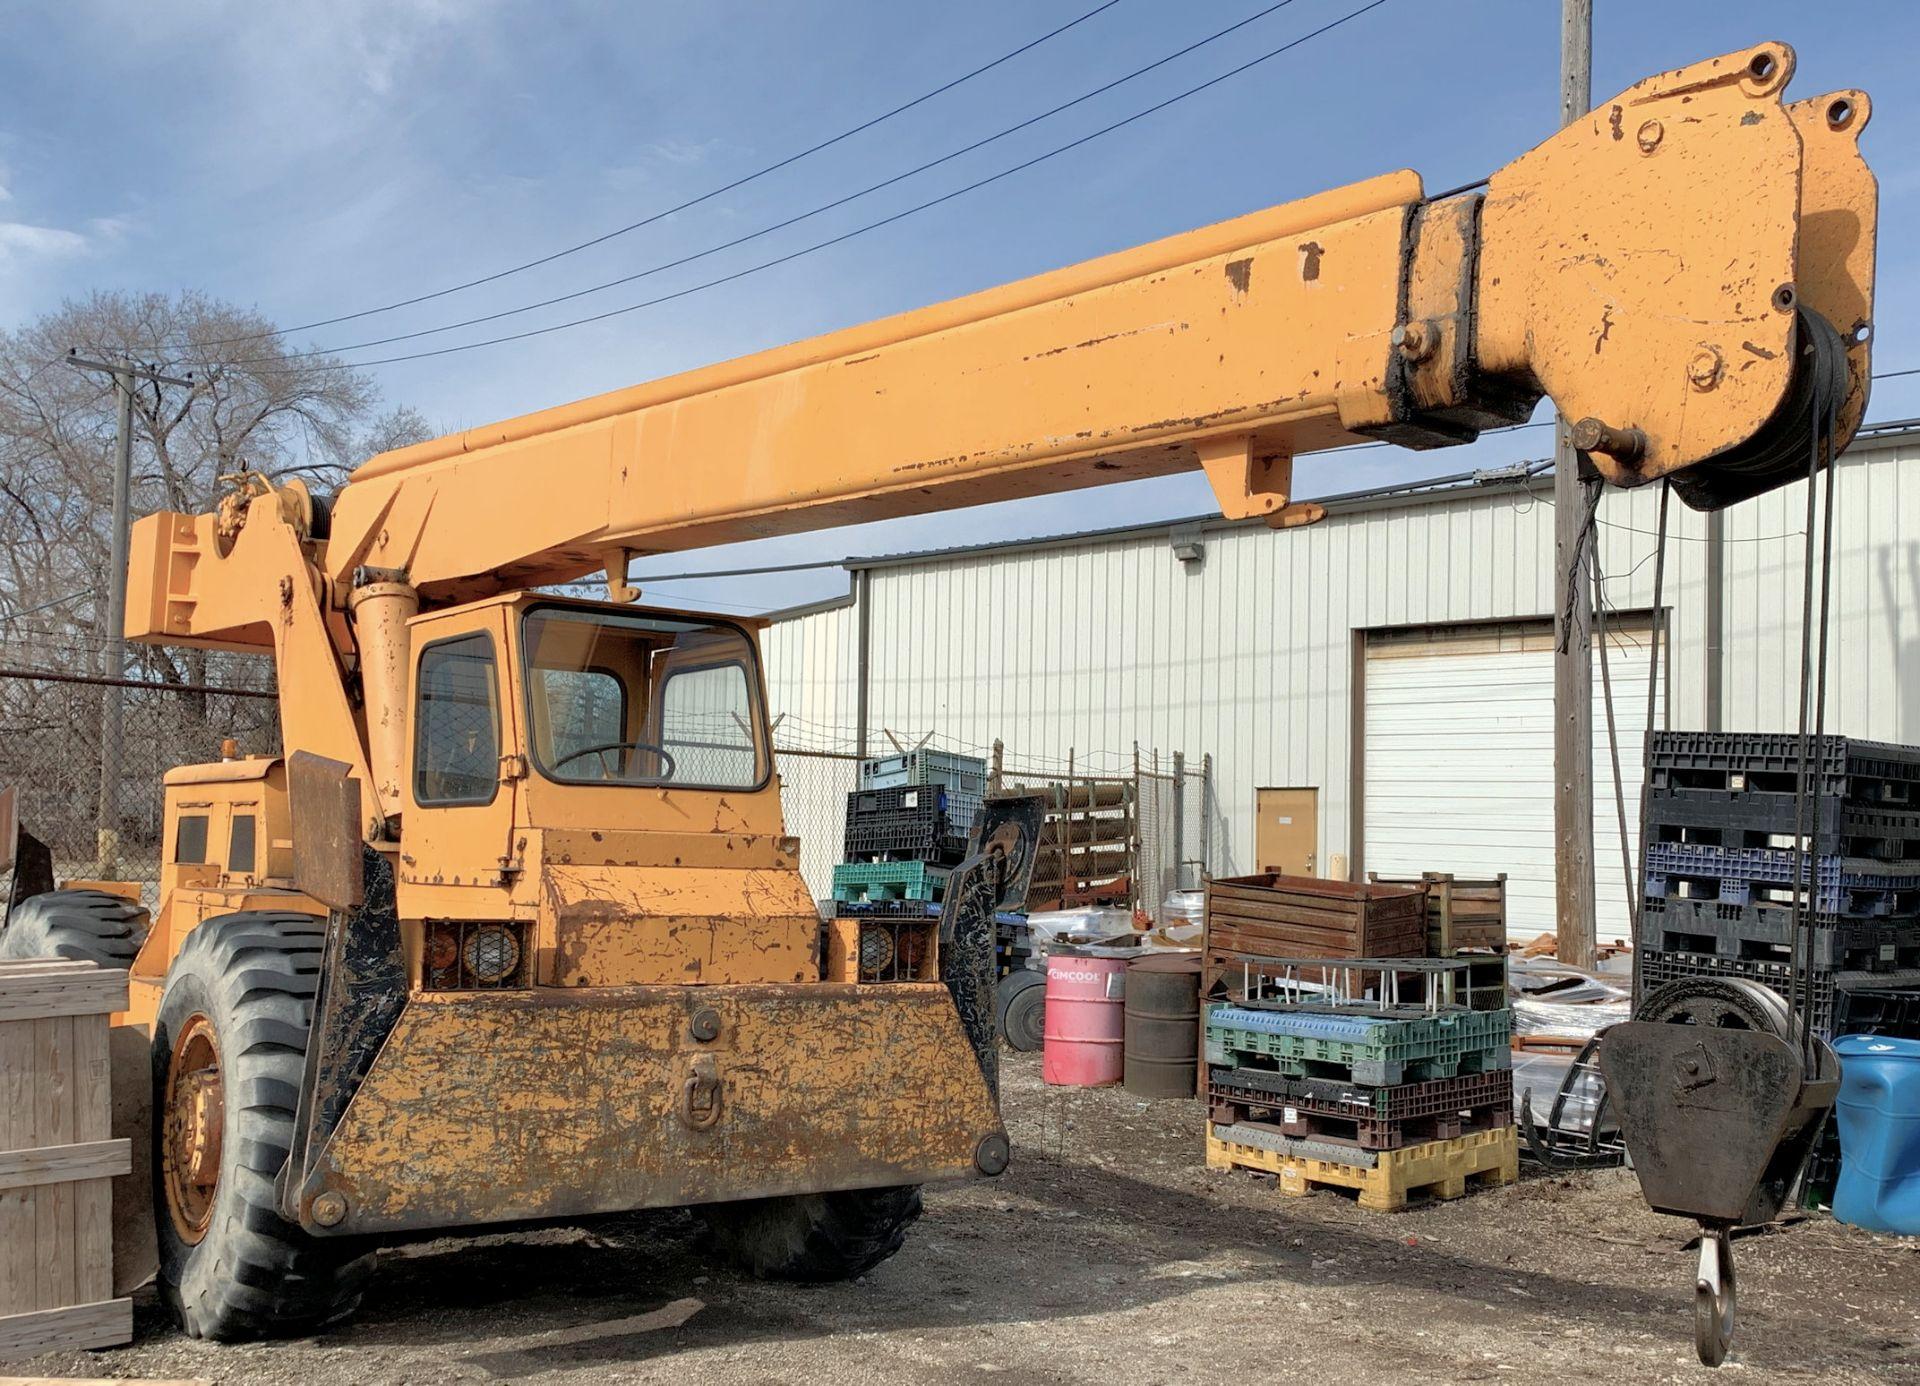 Lot 653 - Grove Model RT48, 14-Ton Capacity Fully Hydraulic Self-Propelled Gasoline Powered Boom Crane